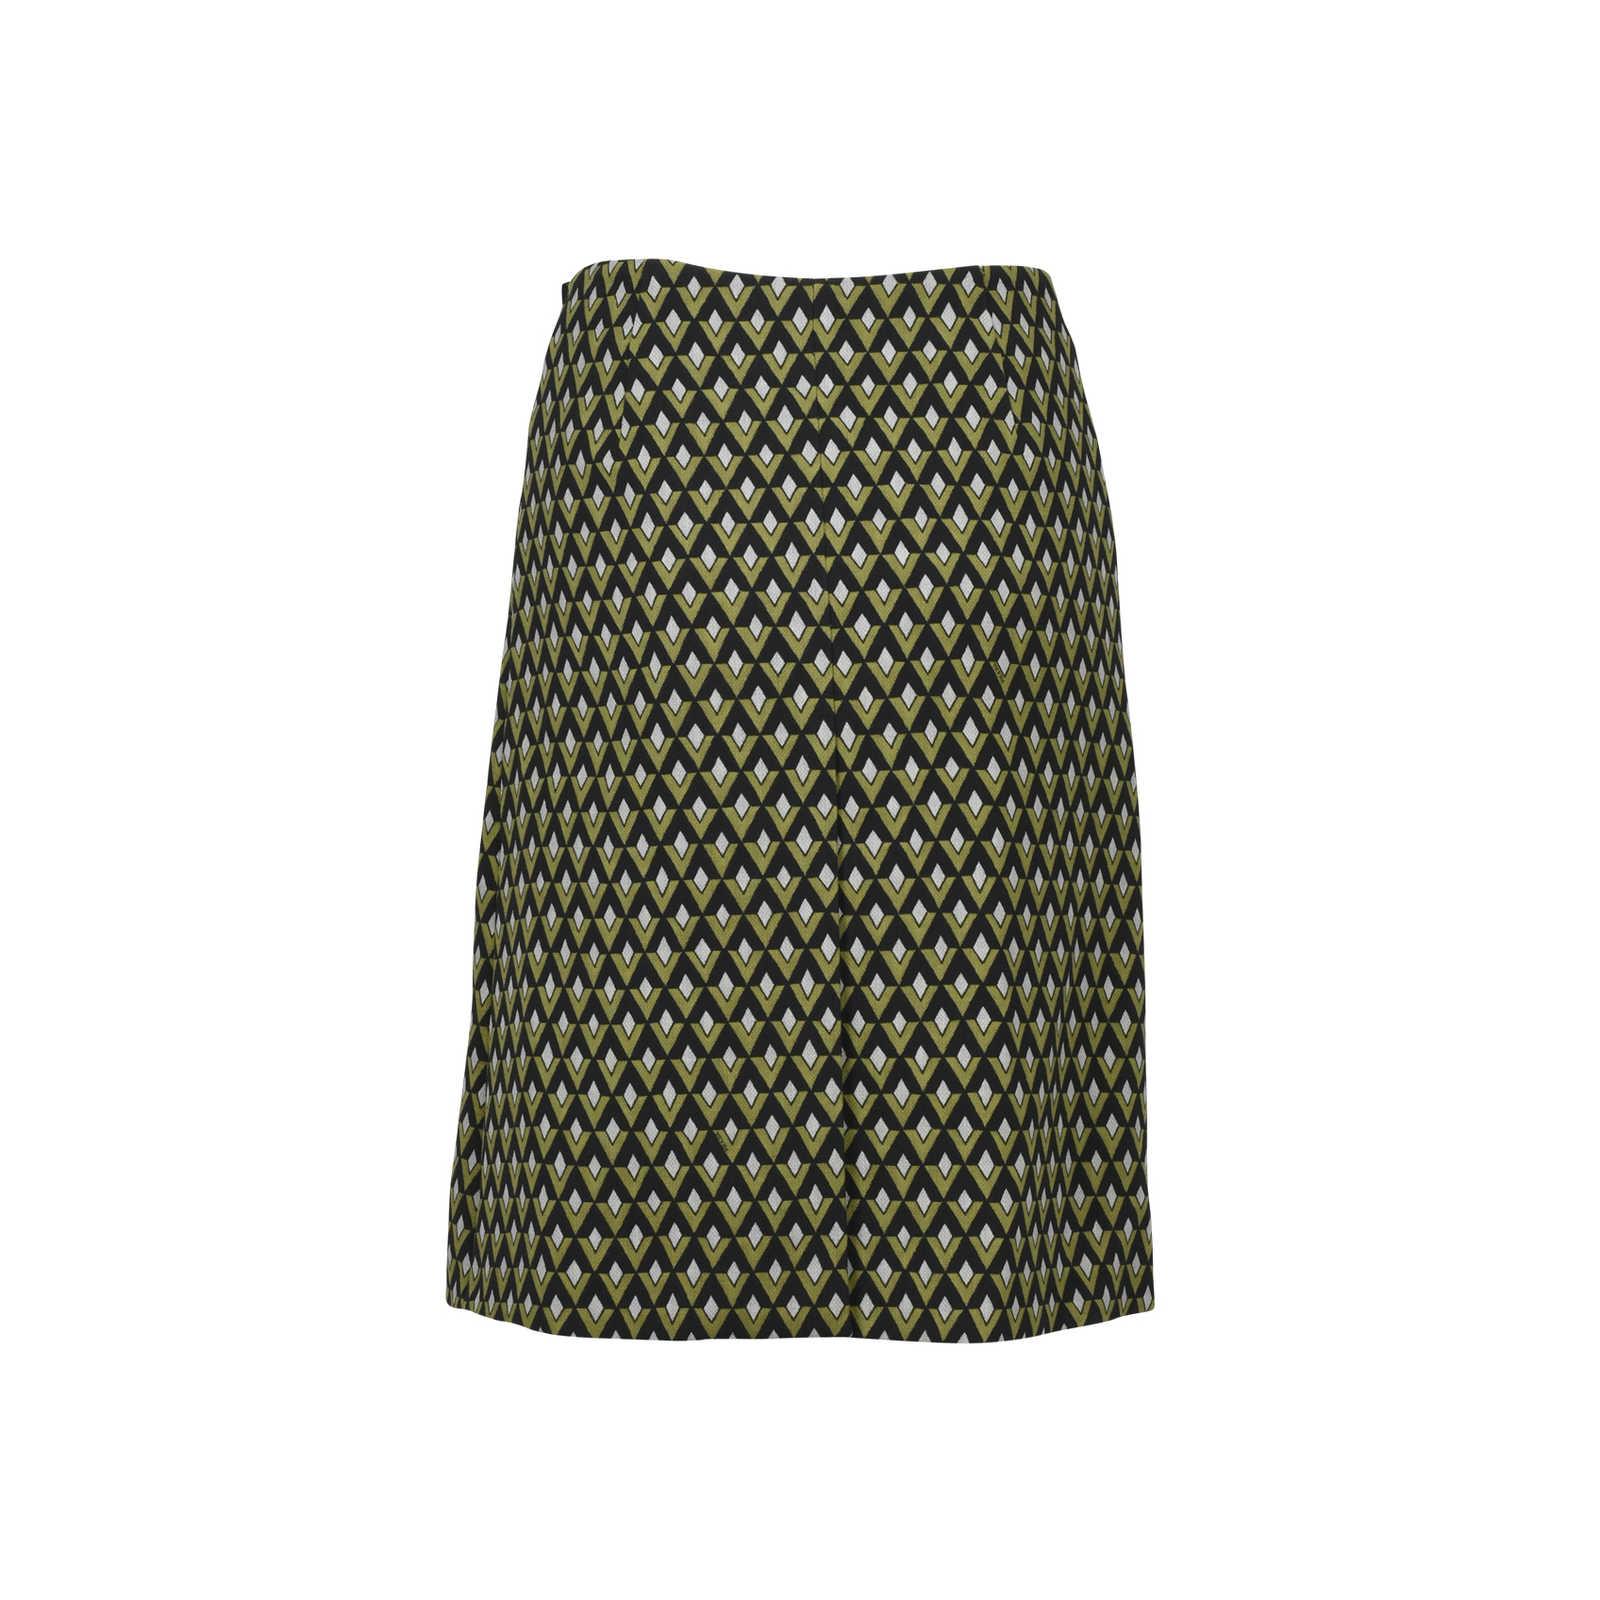 38c844b92 ... Authentic Second Hand Prada Geometric Embellished Skirt (PSS-228-00025)  - Thumbnail ...